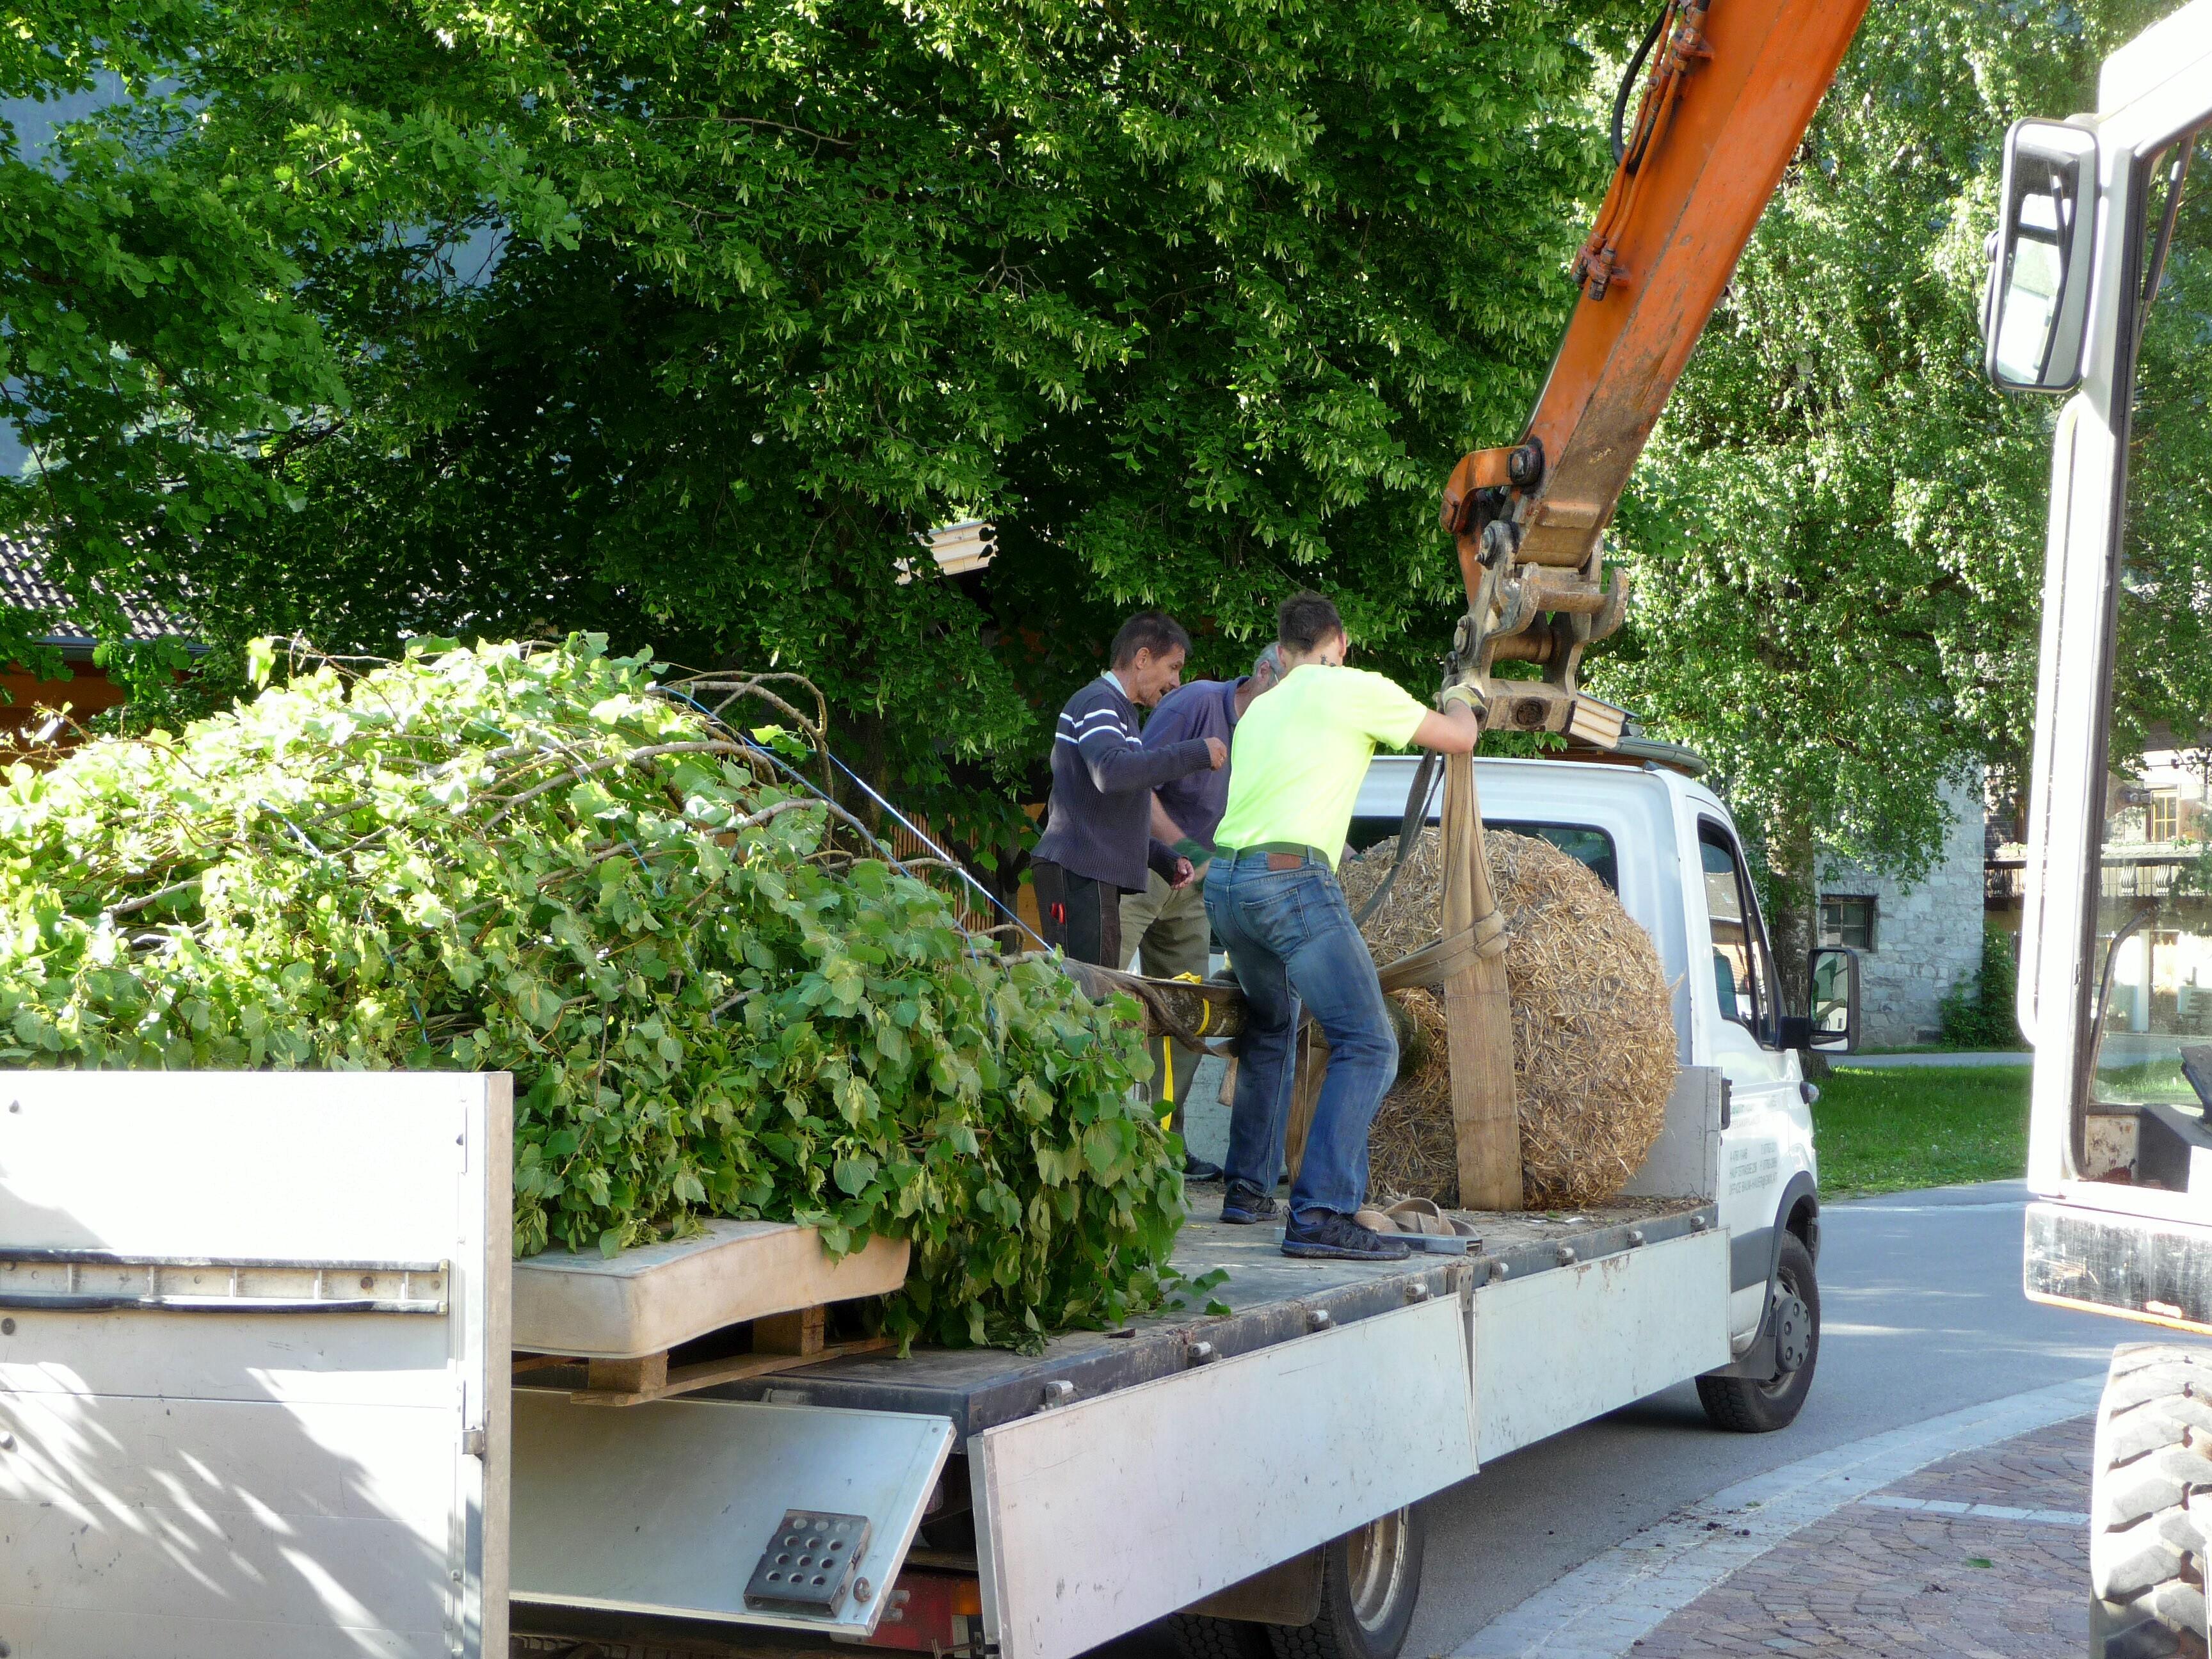 Anlieferung der Bäume